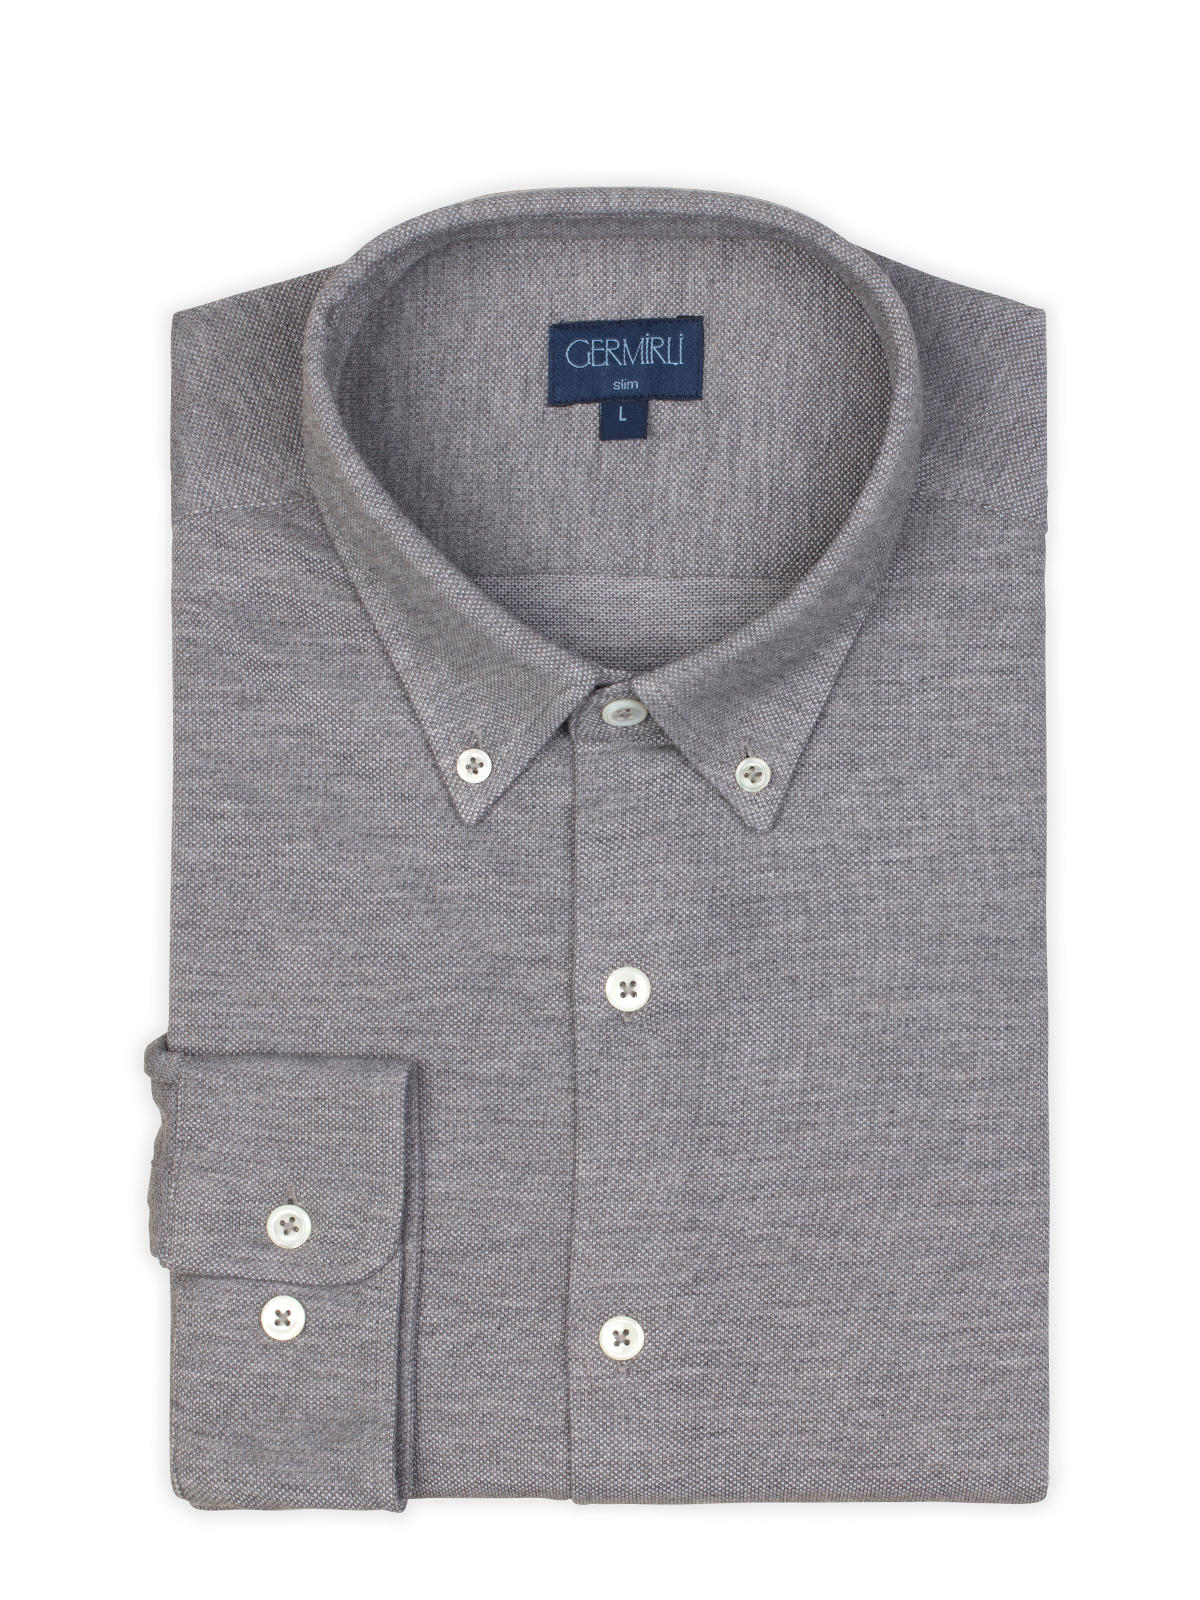 Germirli Grey Button Down Collar Piquet Knitted Slim Fit Shirt